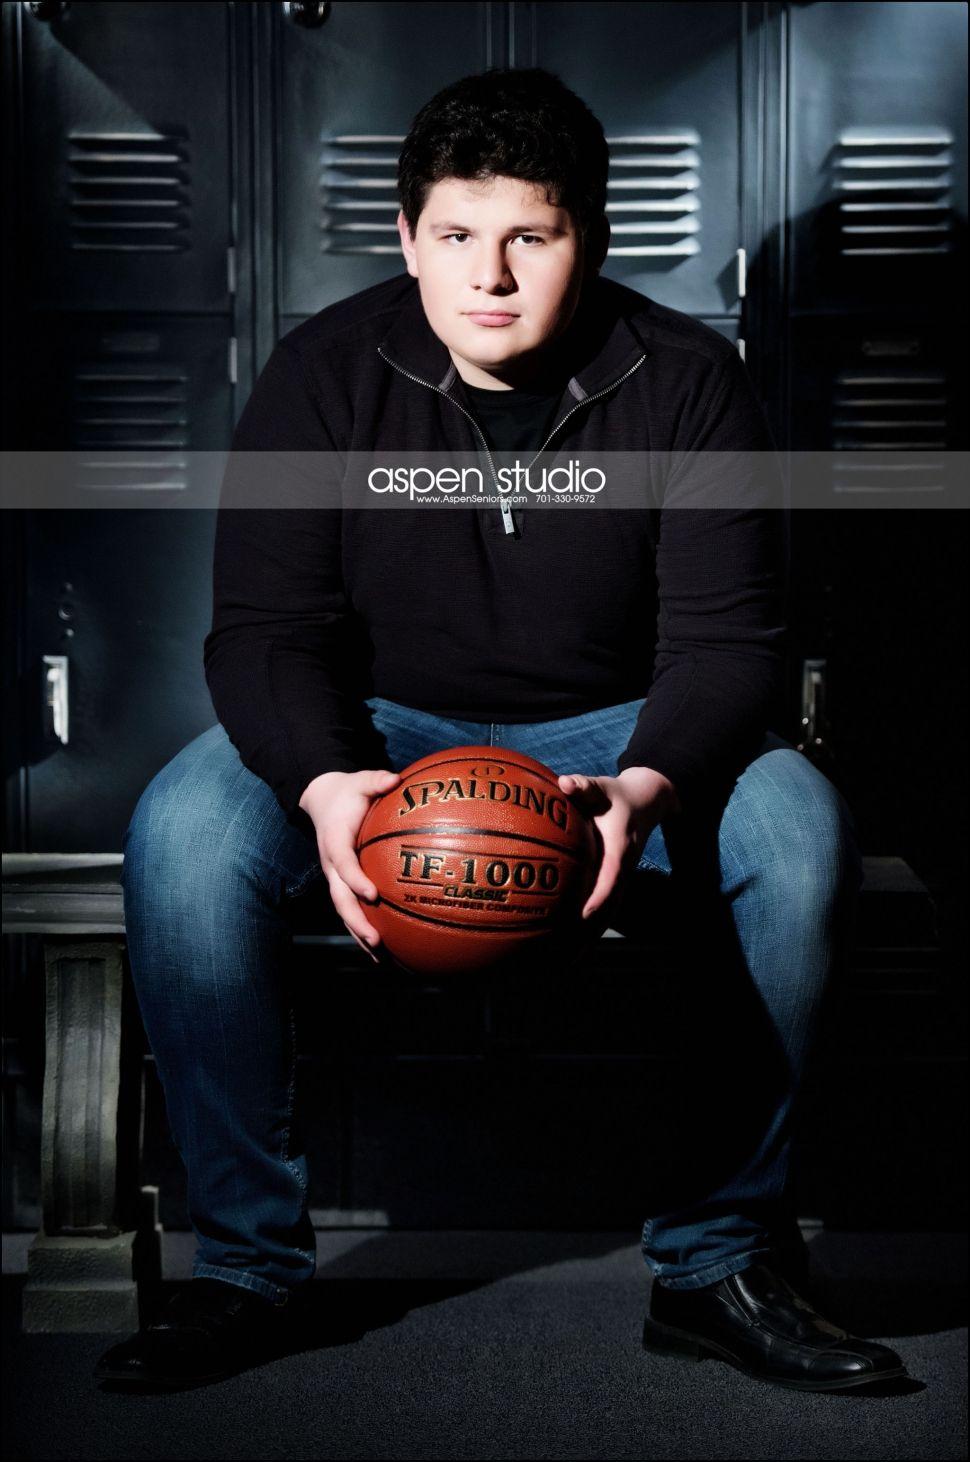 Alejandro basketball fan sports ideas senior